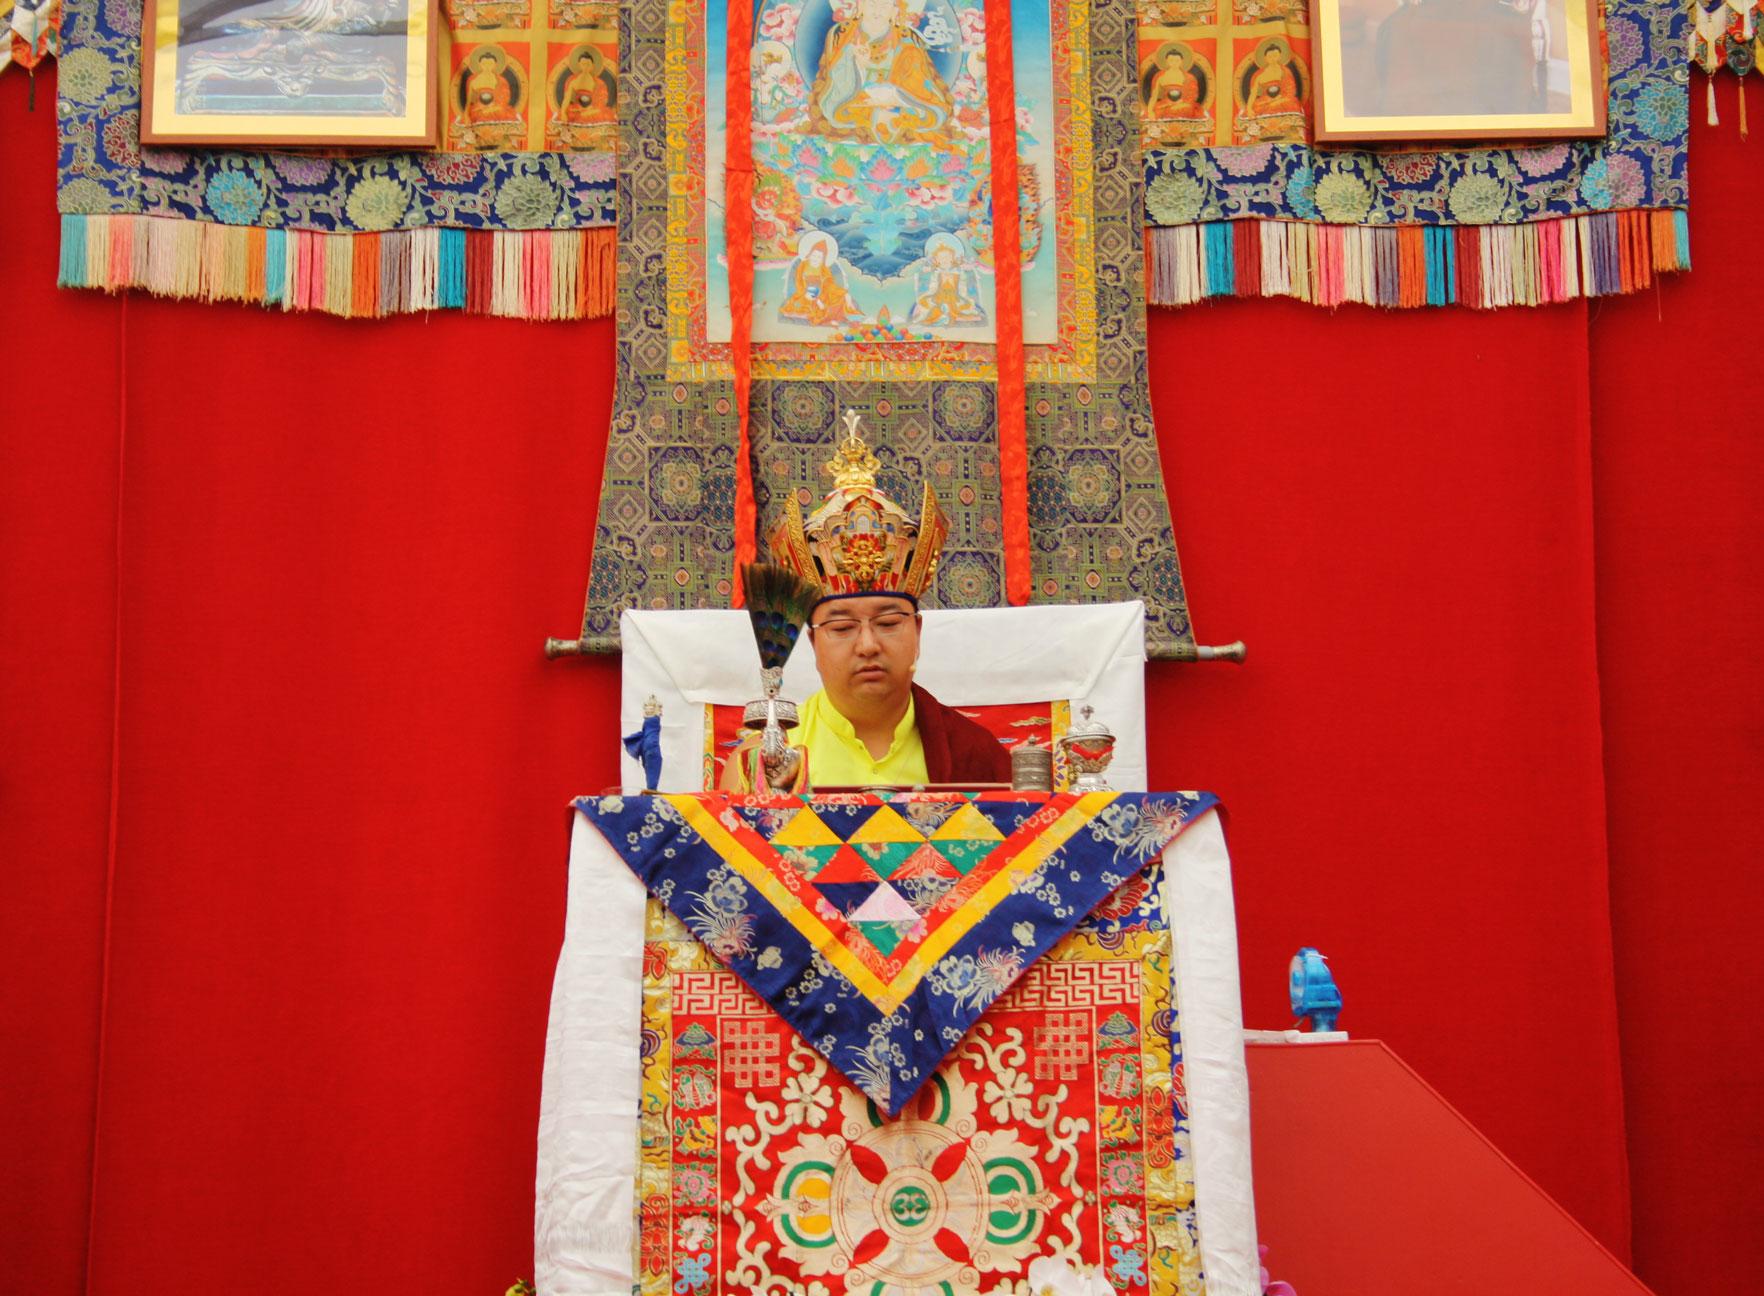 SS-Dudjom-Rinpoche-Sangye-Pema-Zhepa-evento-valencia-julio-2019-10